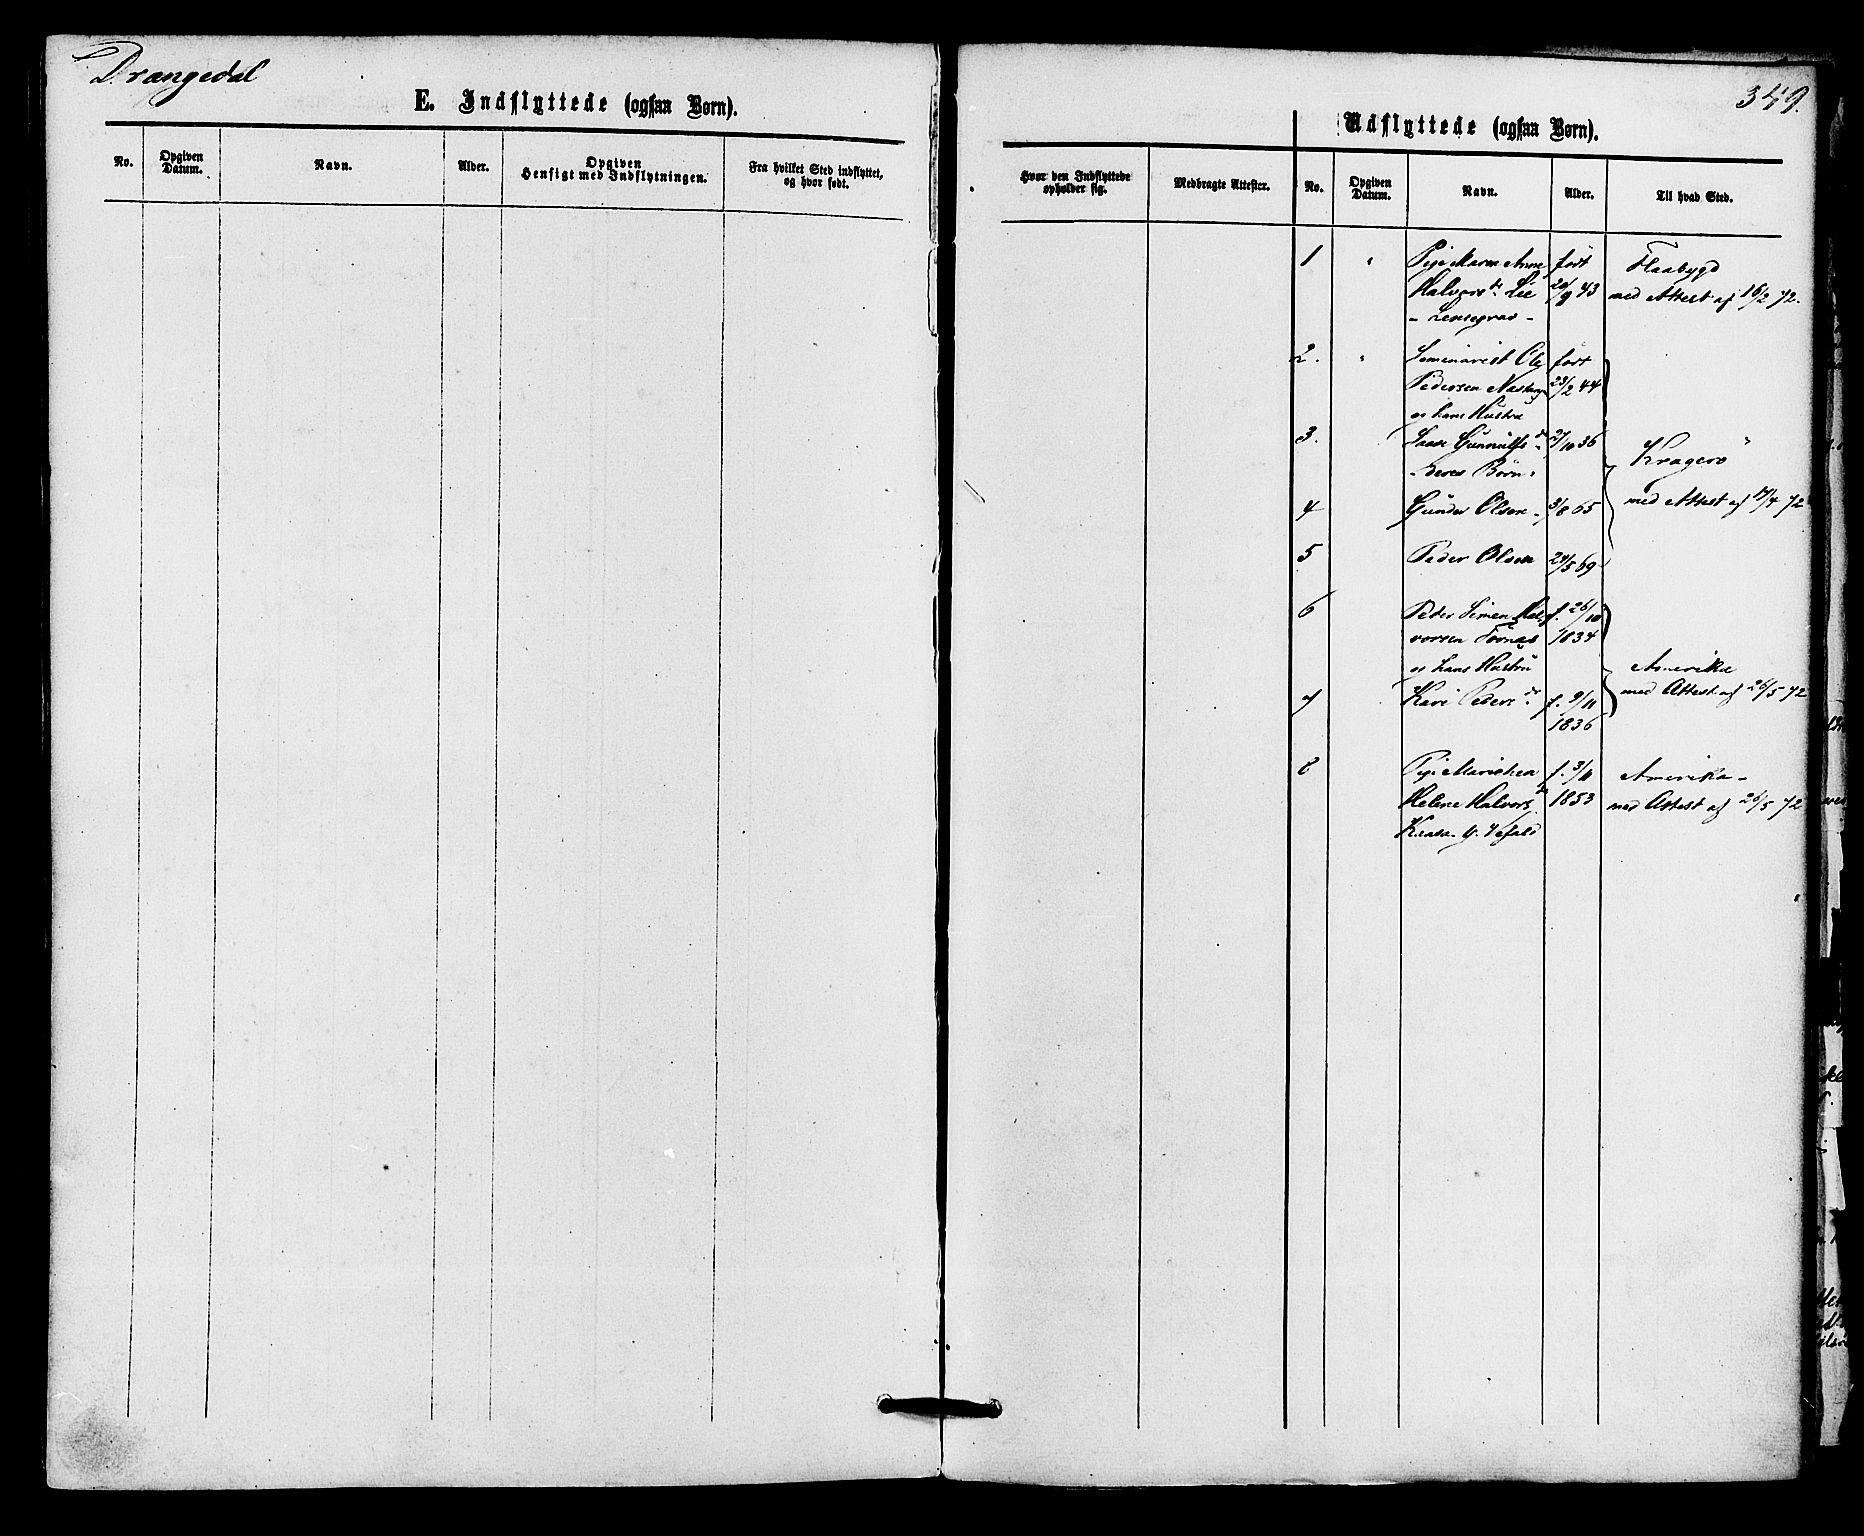 SAKO, Drangedal kirkebøker, F/Fa/L0009: Ministerialbok nr. 9 /1, 1872-1884, s. 349